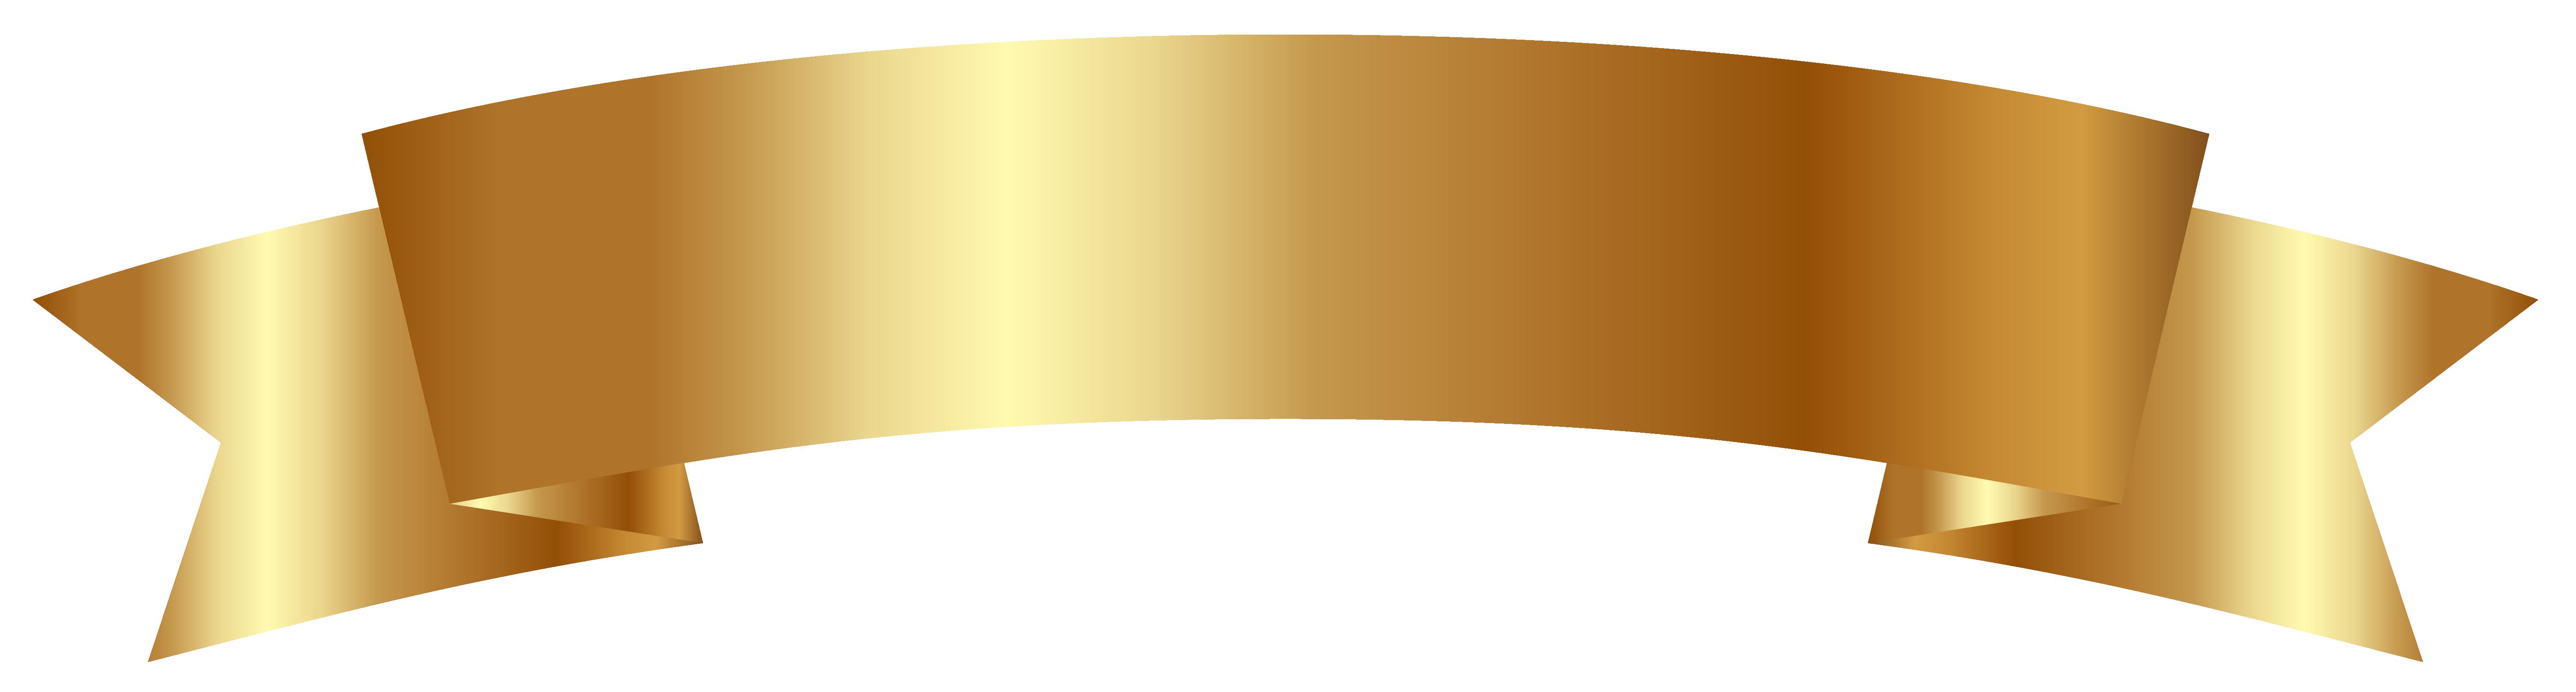 Ribbon gold. Pin by mahmudin udin